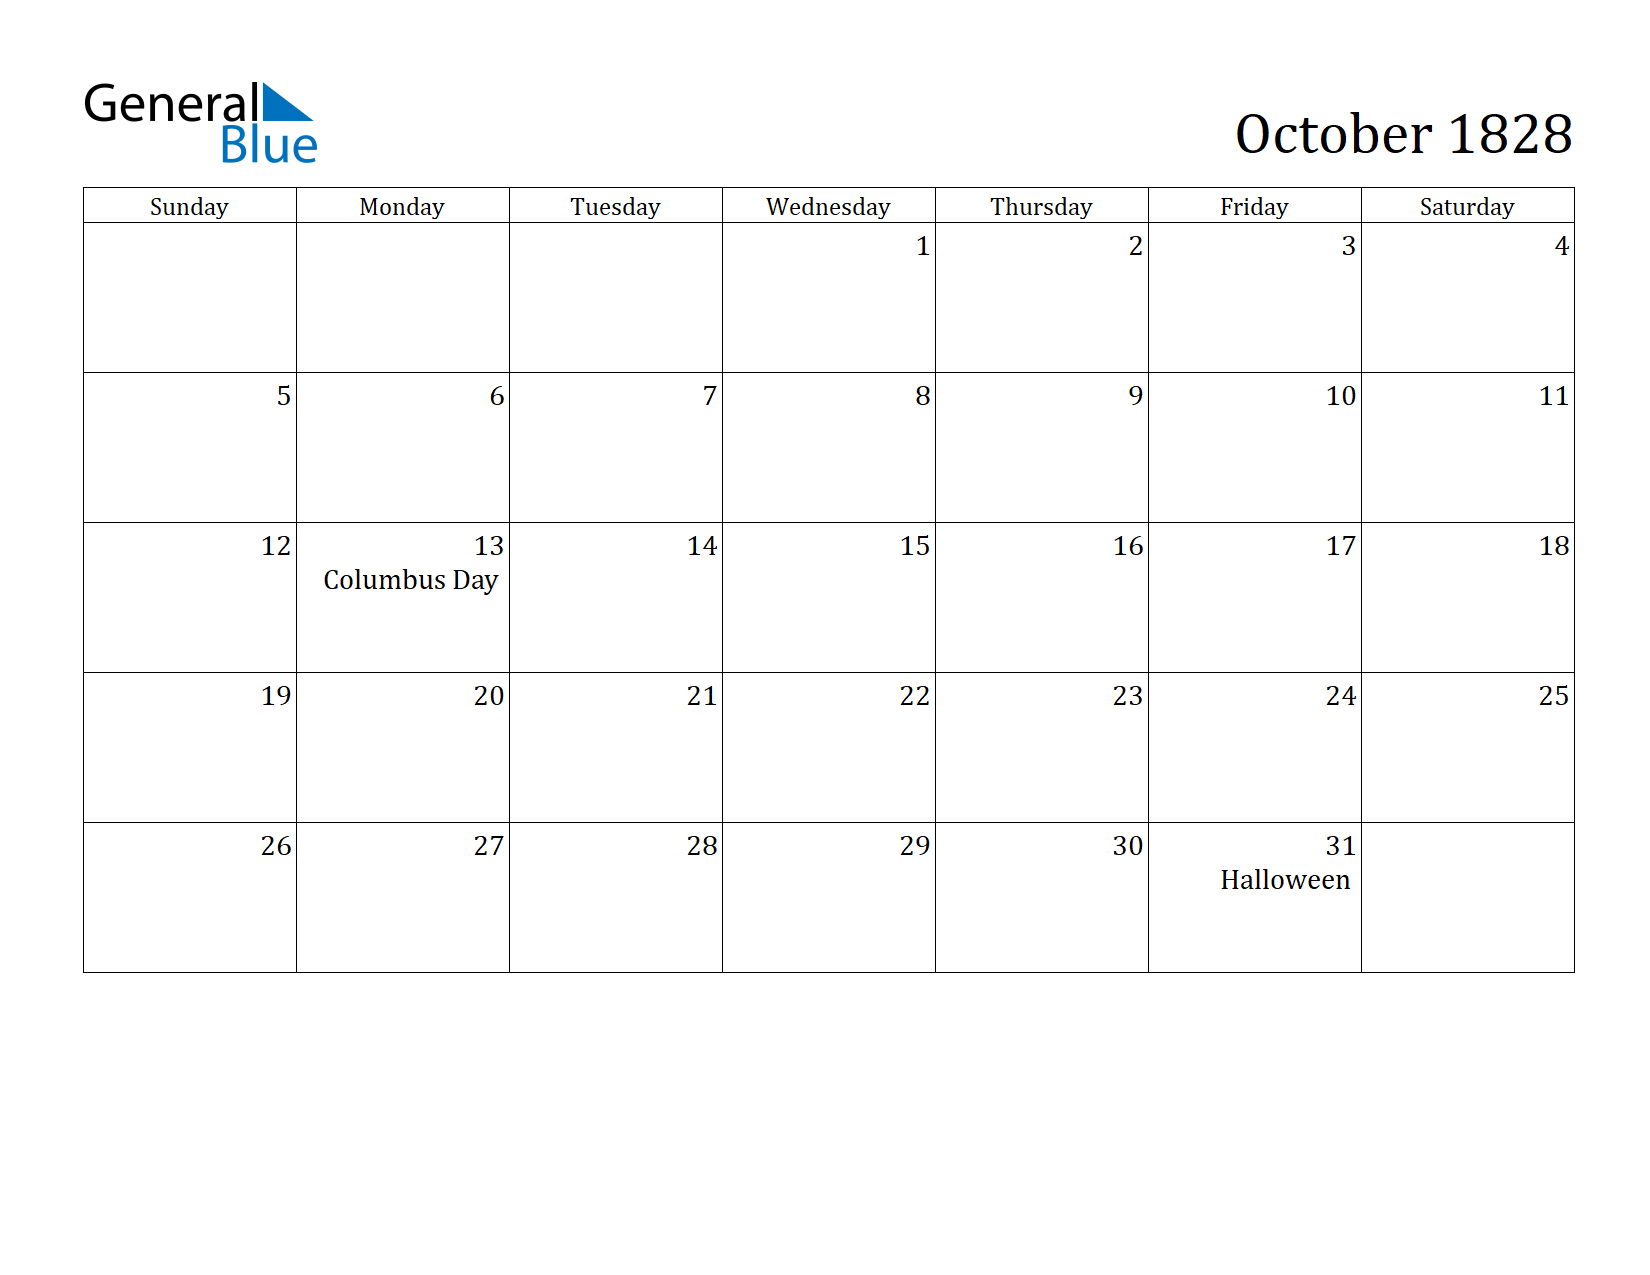 Image of October 1828 Calendar